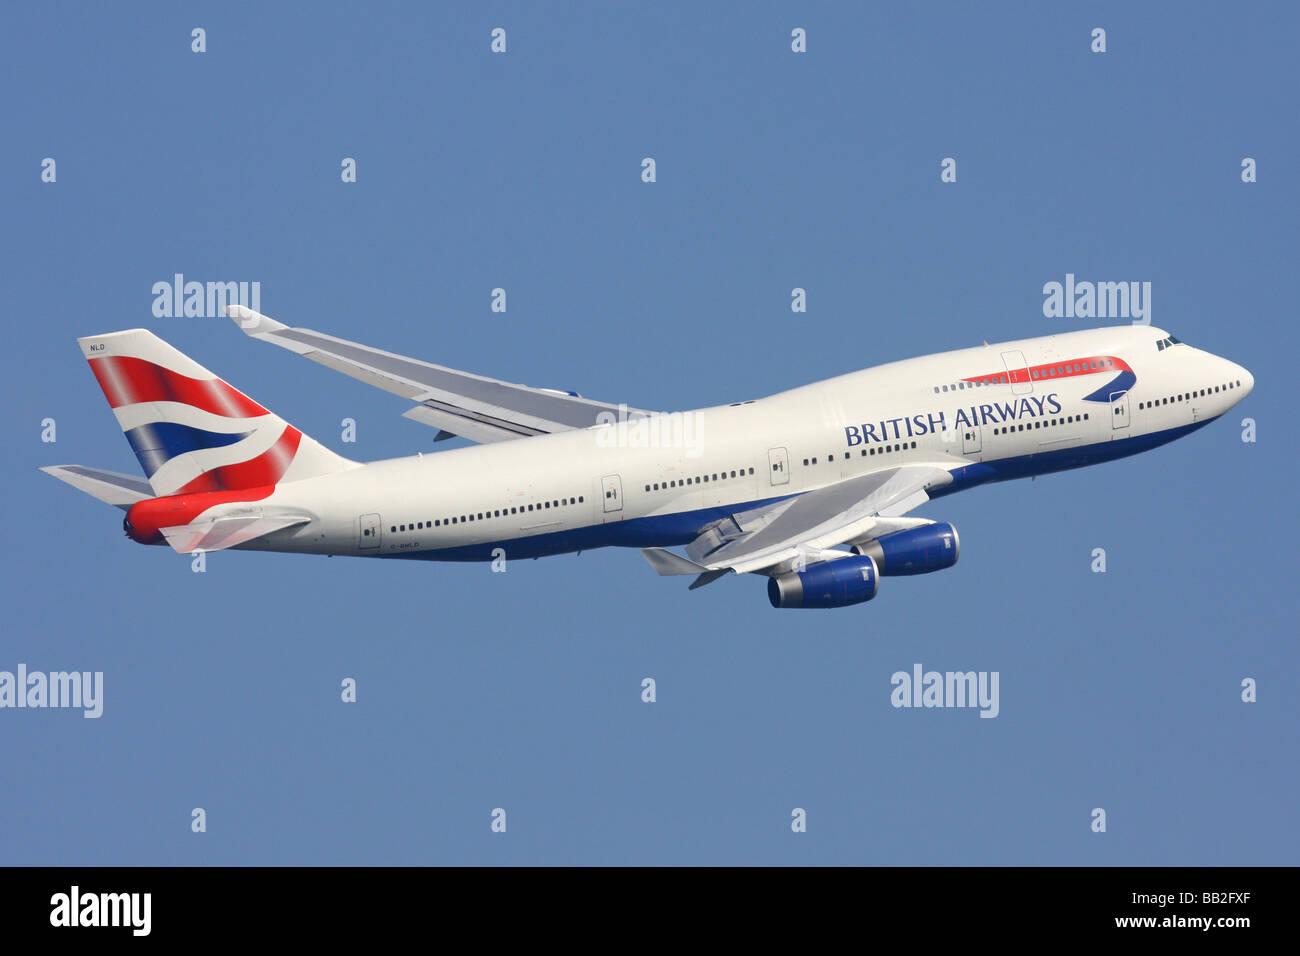 British Airways Boeing 747 departing London Heathrow - Stock Image